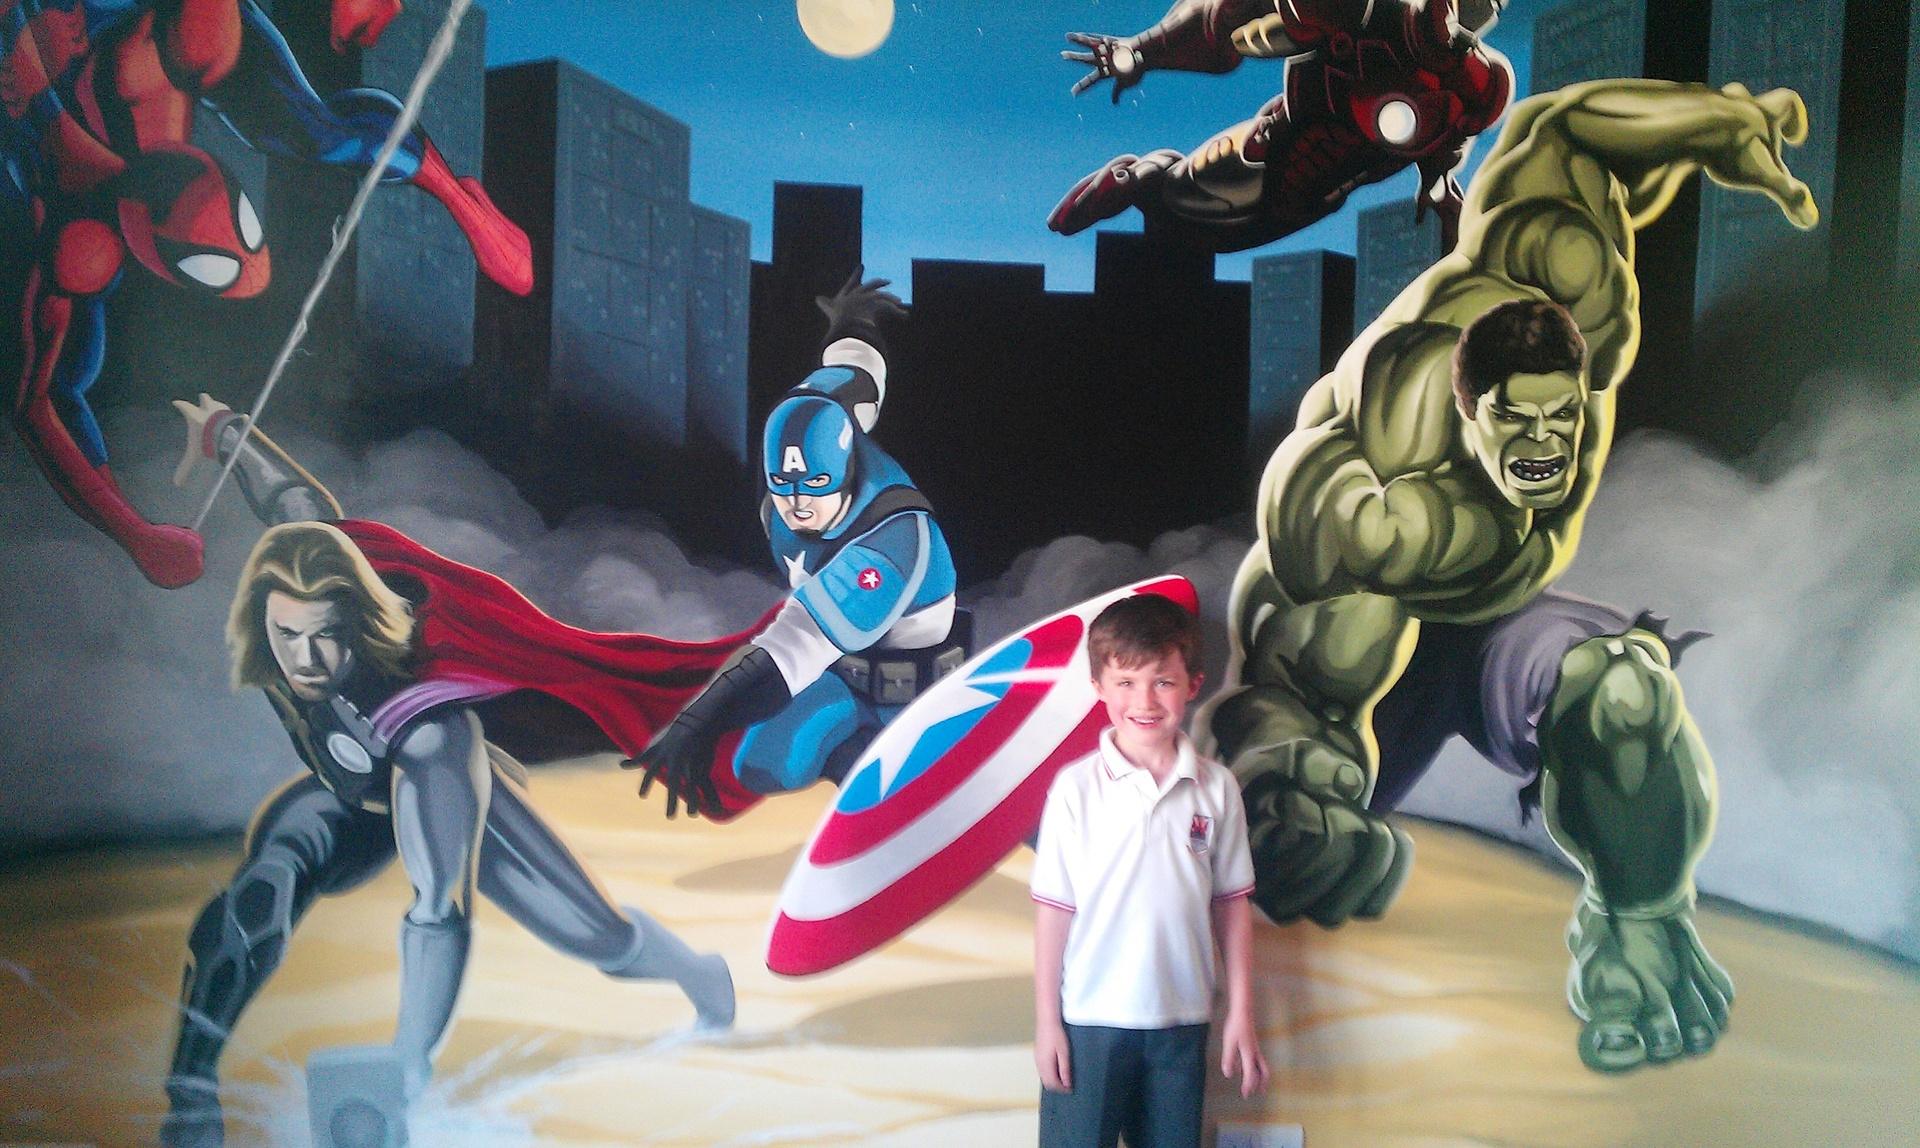 superhero wall mural www galleryhip com the hippest pics gallery for gt superhero cityscape mural